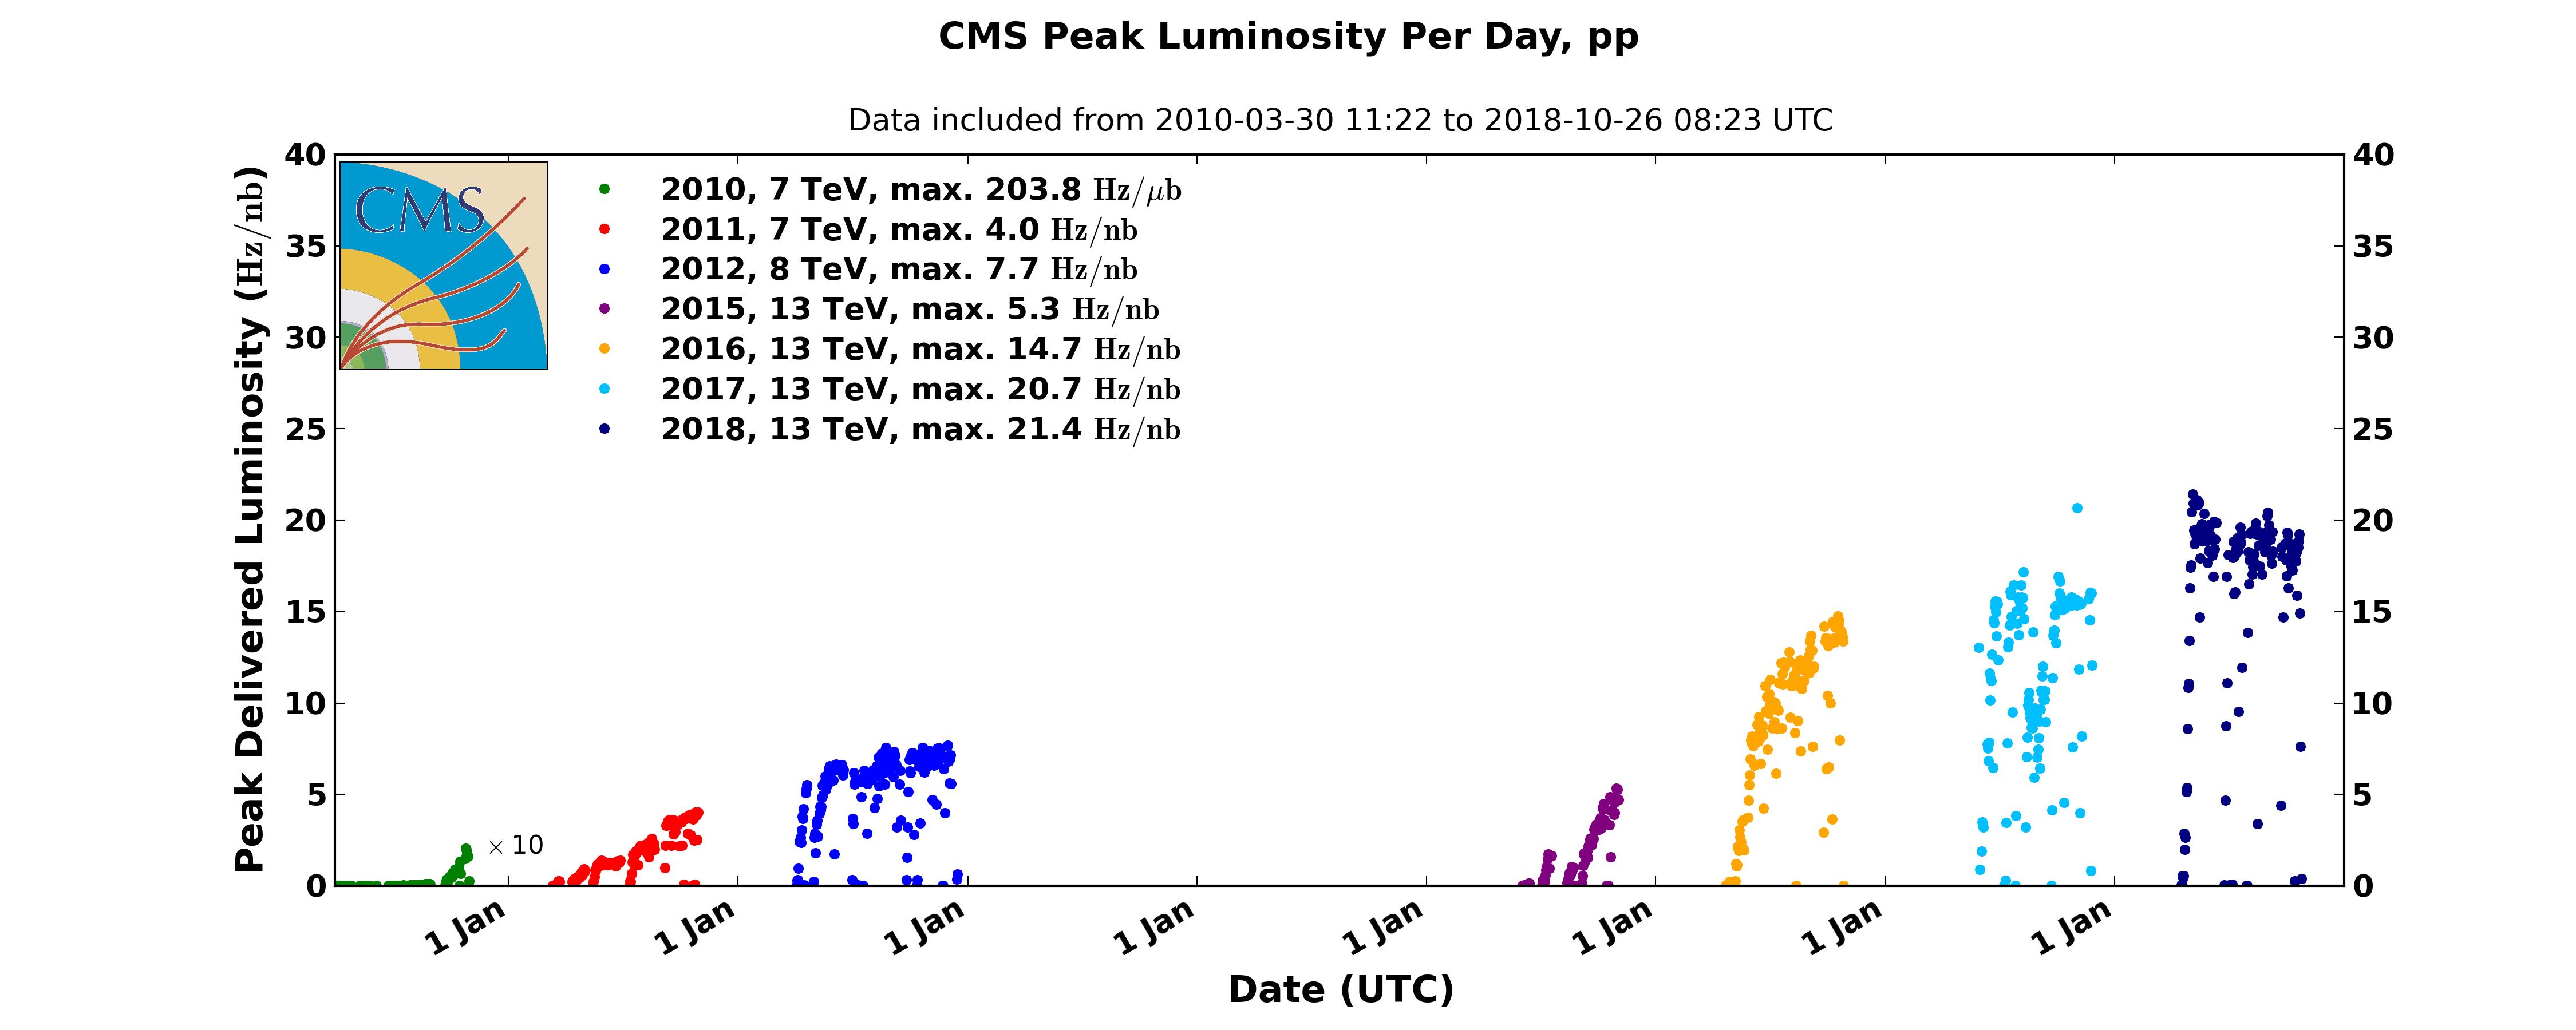 https://cern.ch/cmslumi/publicplots/peak_lumi_pp.png